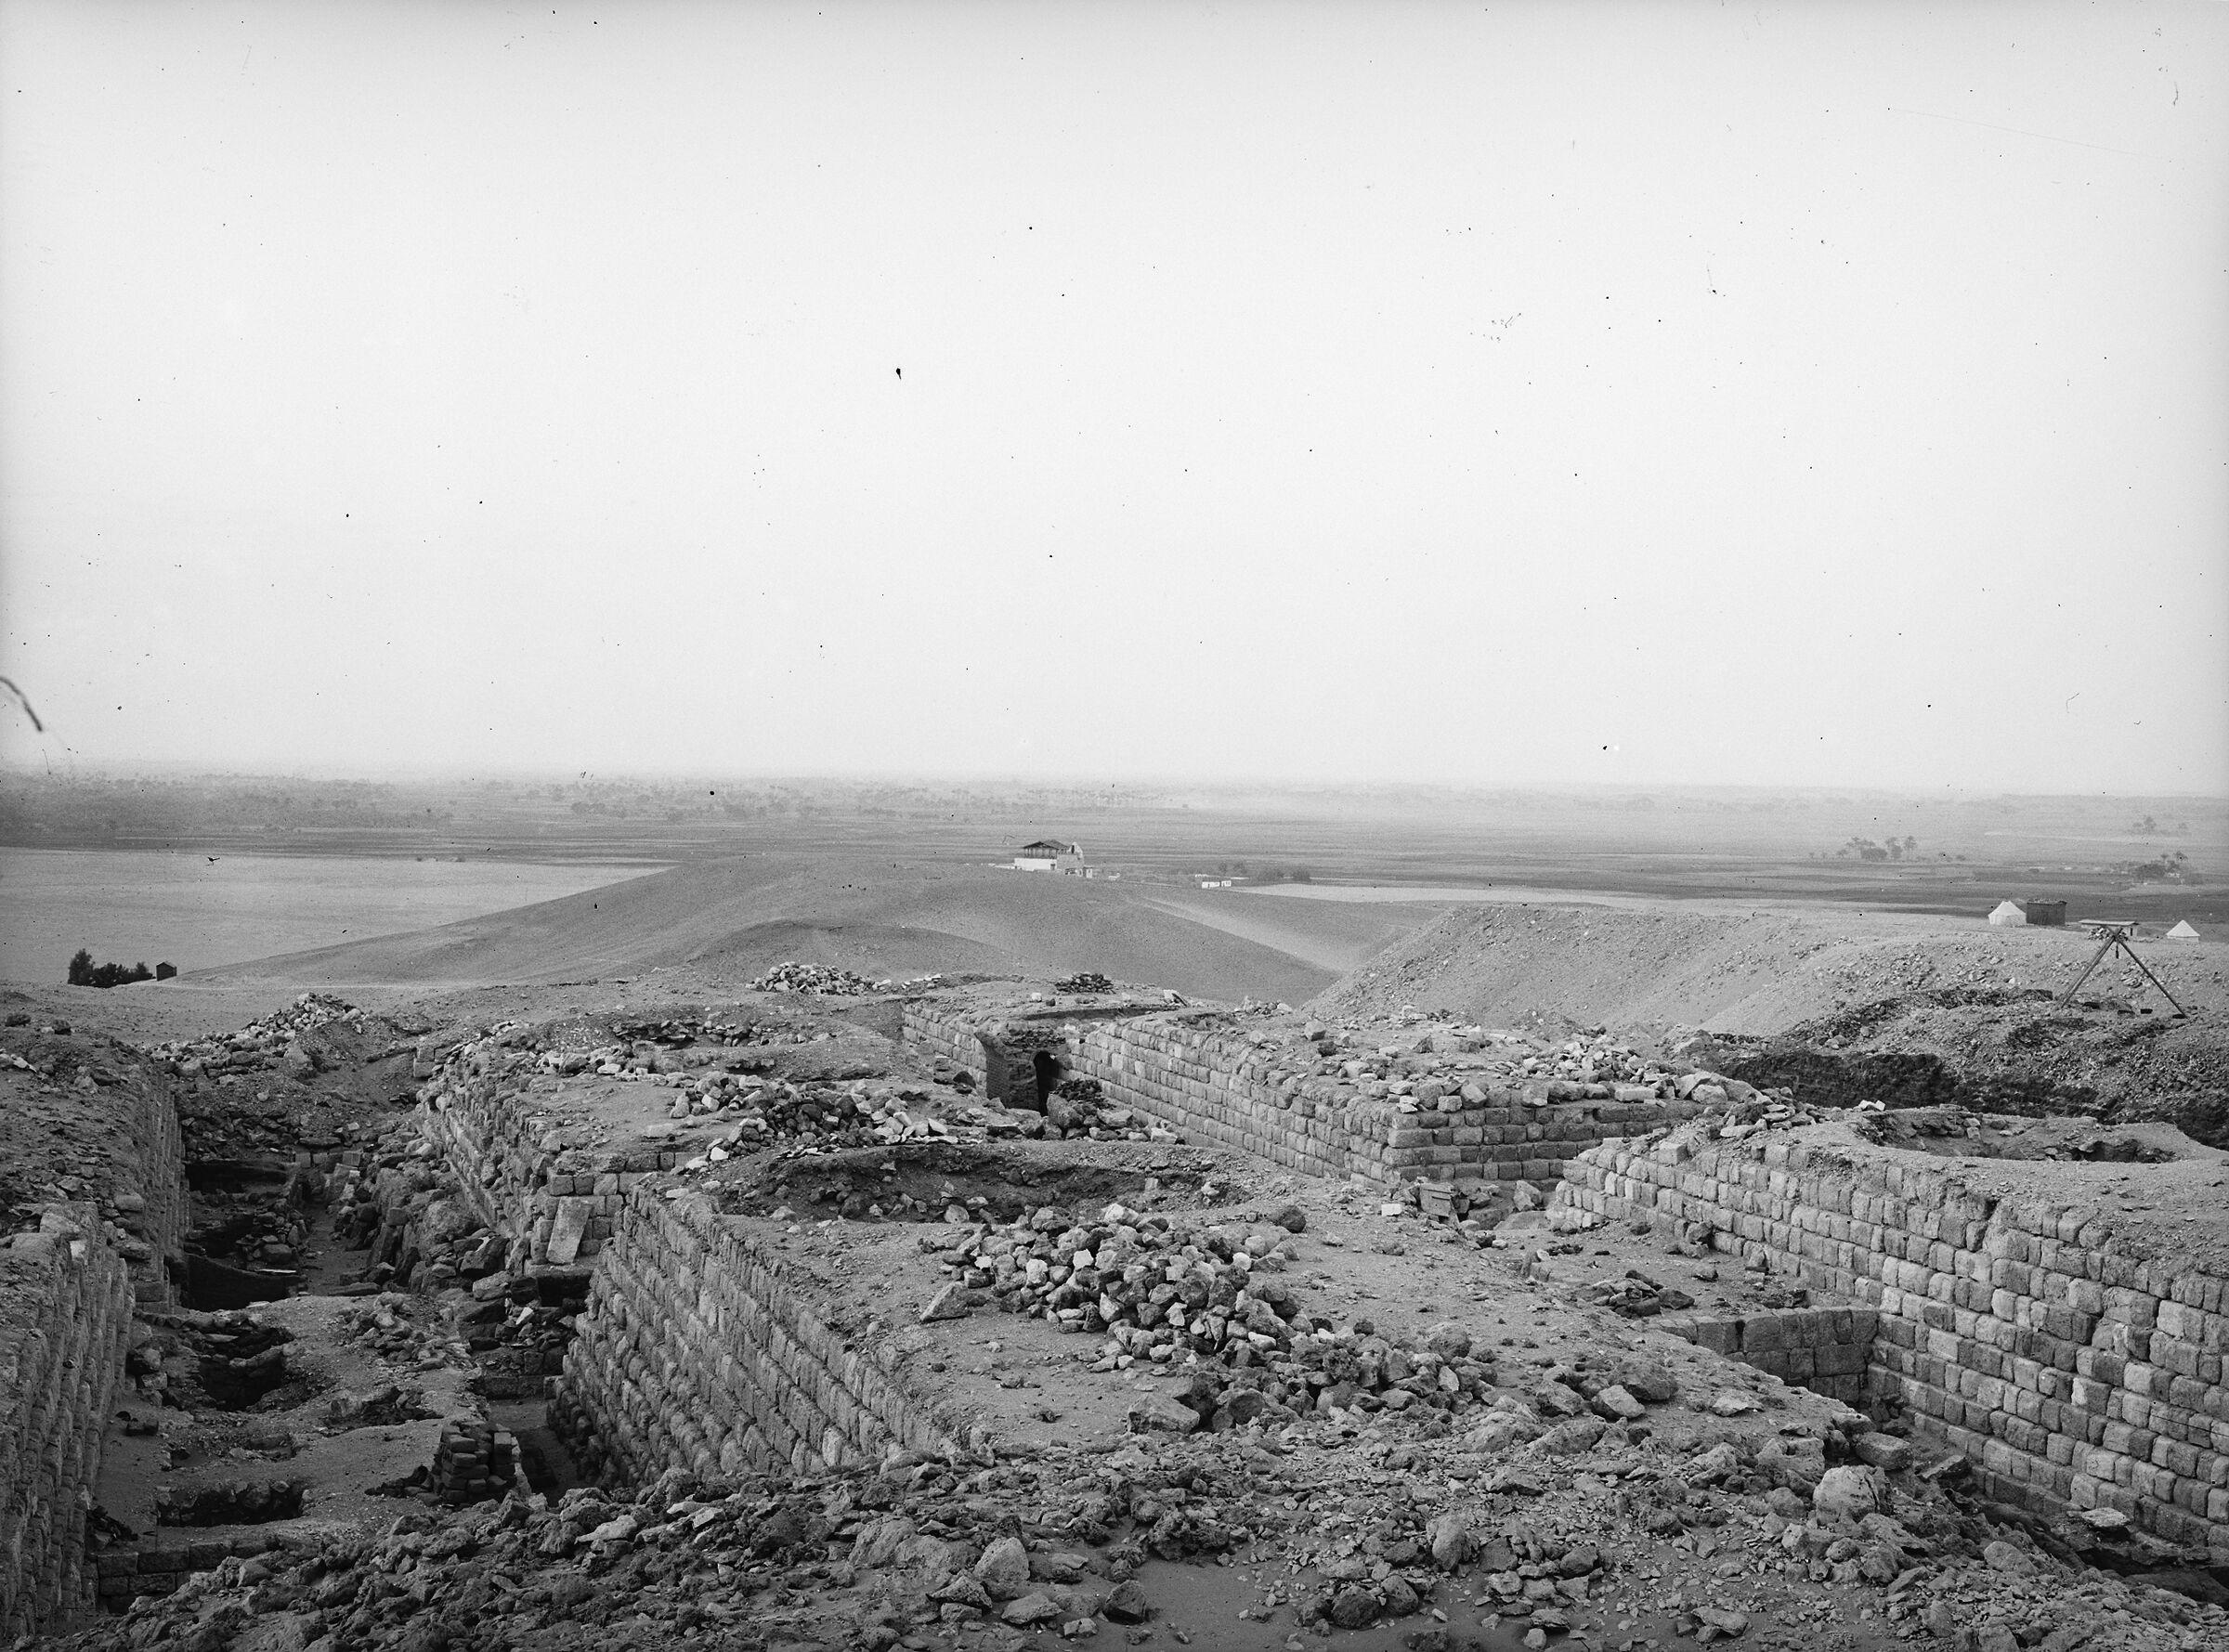 Western Cemetery: Site: Giza; View: G 1203, G 1223, G 1233, G 1205, G 1225, G 1207, G 1227, G 1206